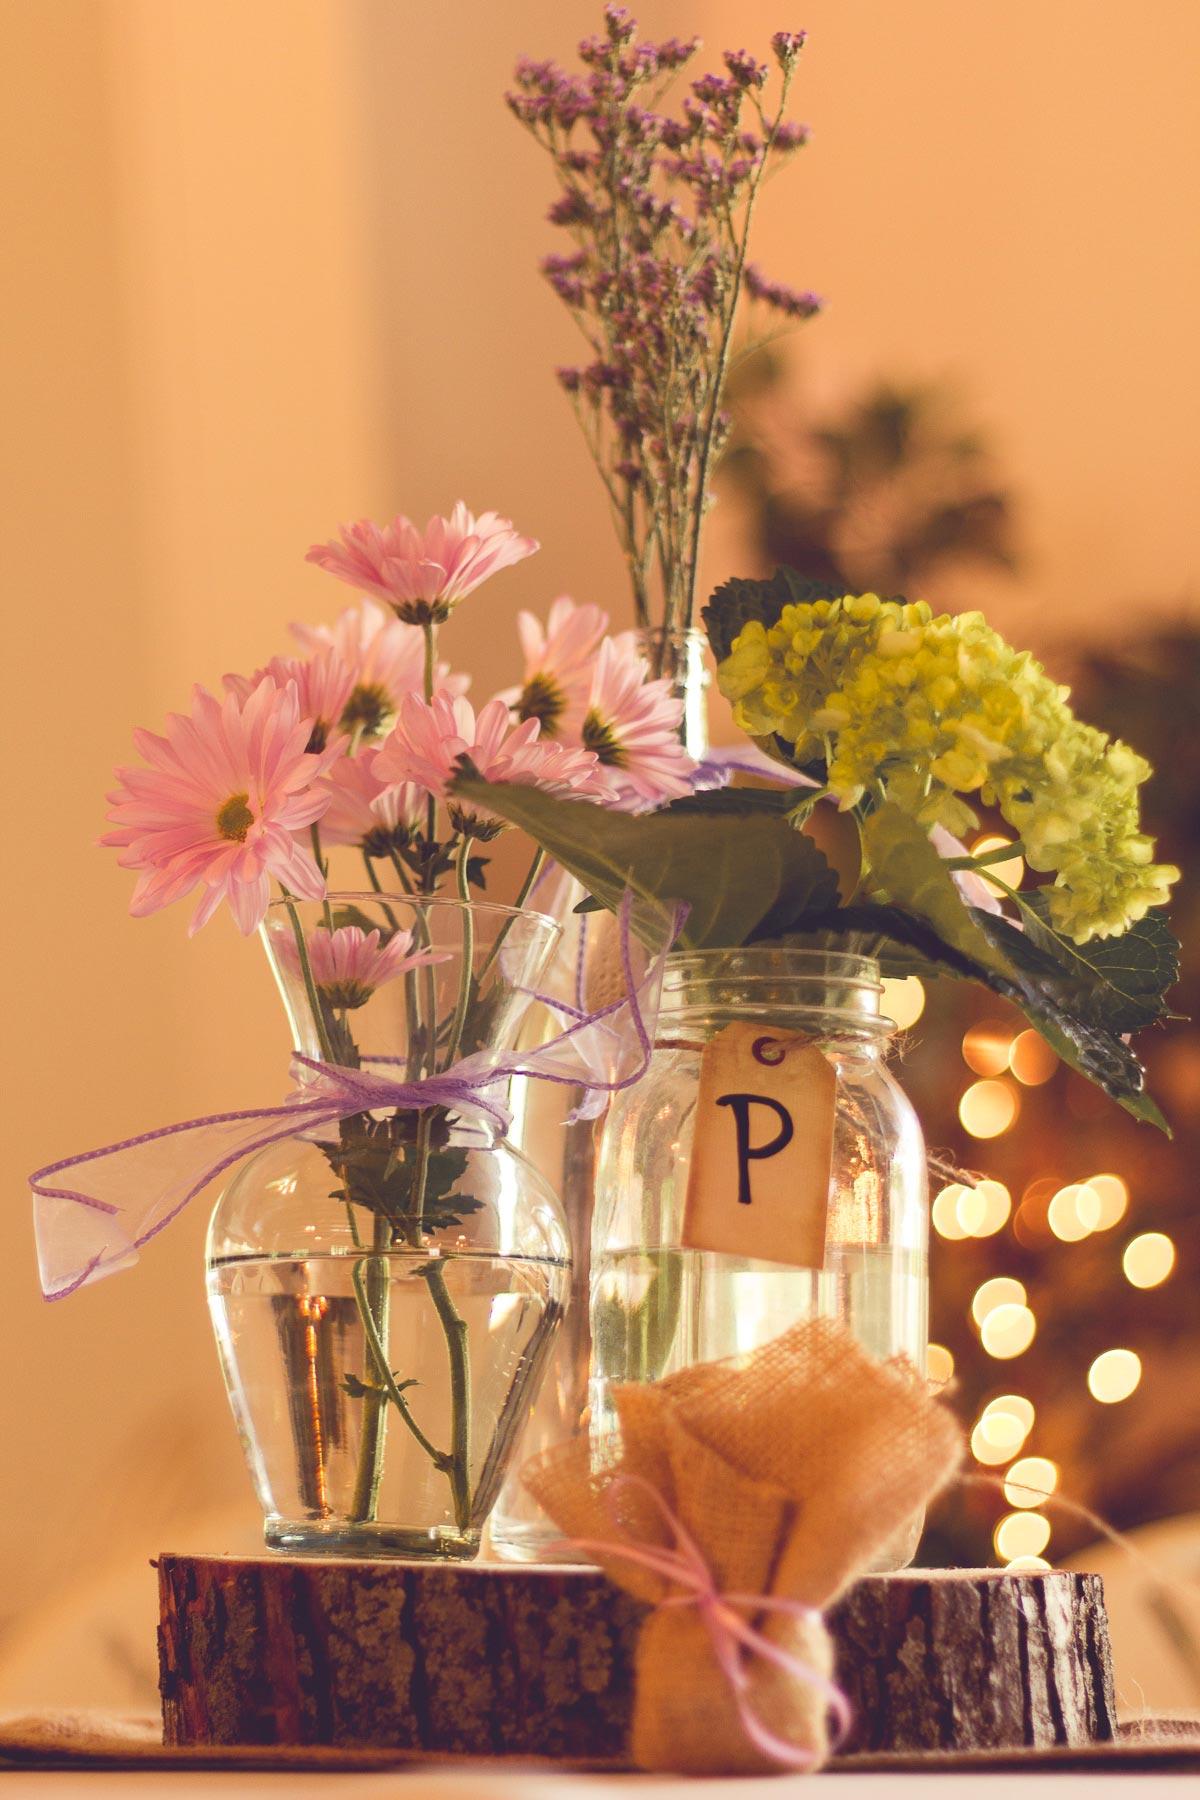 evansville-wedding-photographer-pabst-photo-kokies-echo-valley-(18)